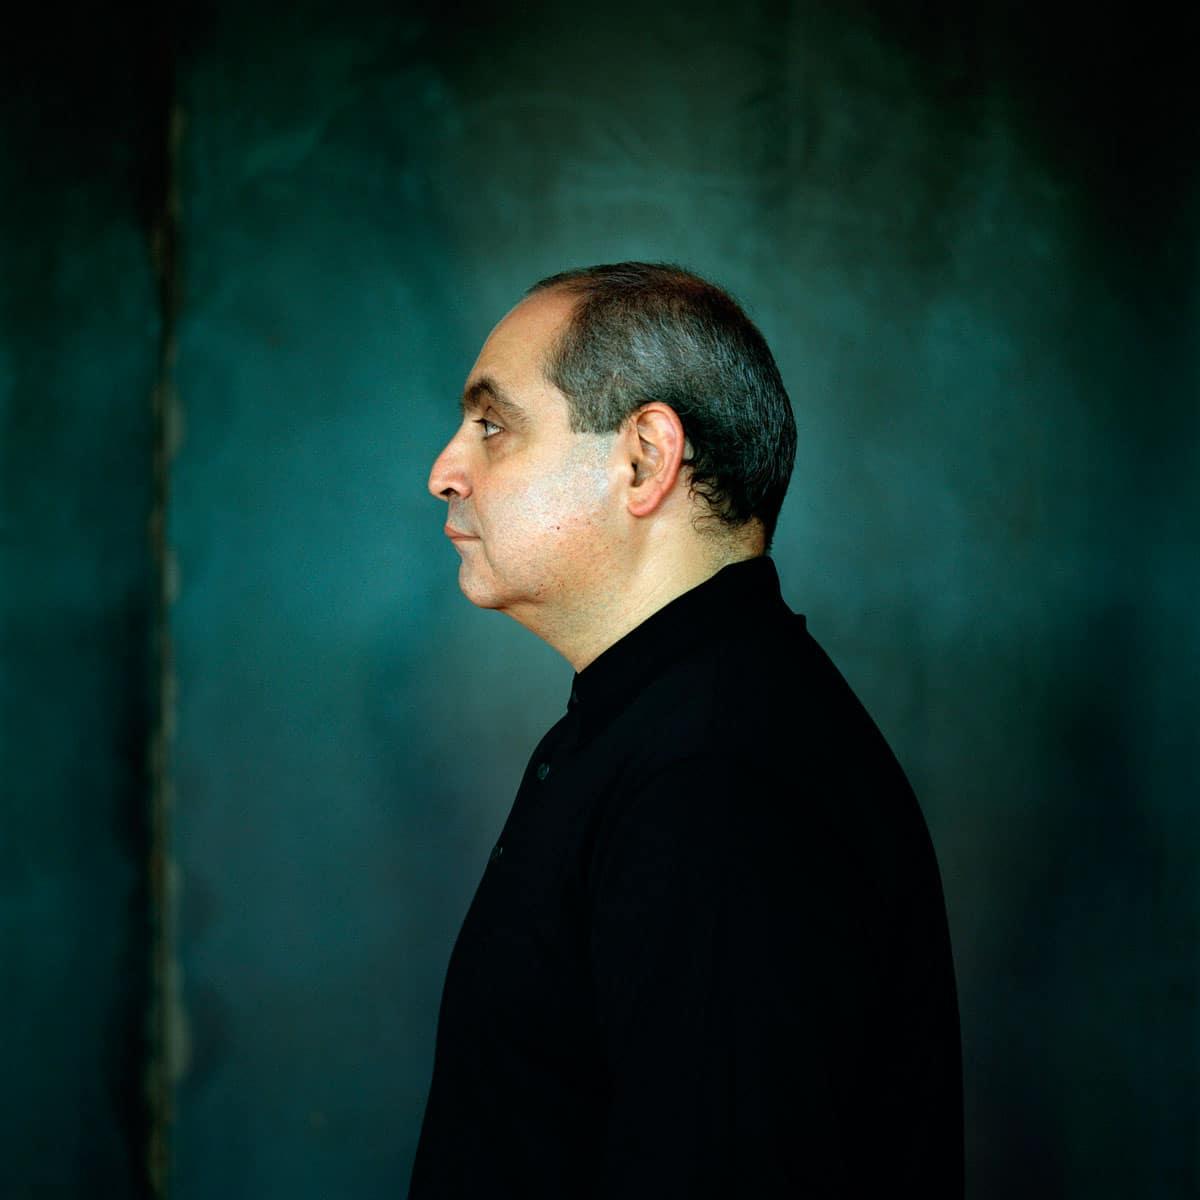 Pierre Audi. Frans-Libanese Opera-, toneel- en filmregisseur (geboren in Libanon 1957) woonachtig te Amsterdam. PHOTO AND COPYRIGHT ROGER CREMERS